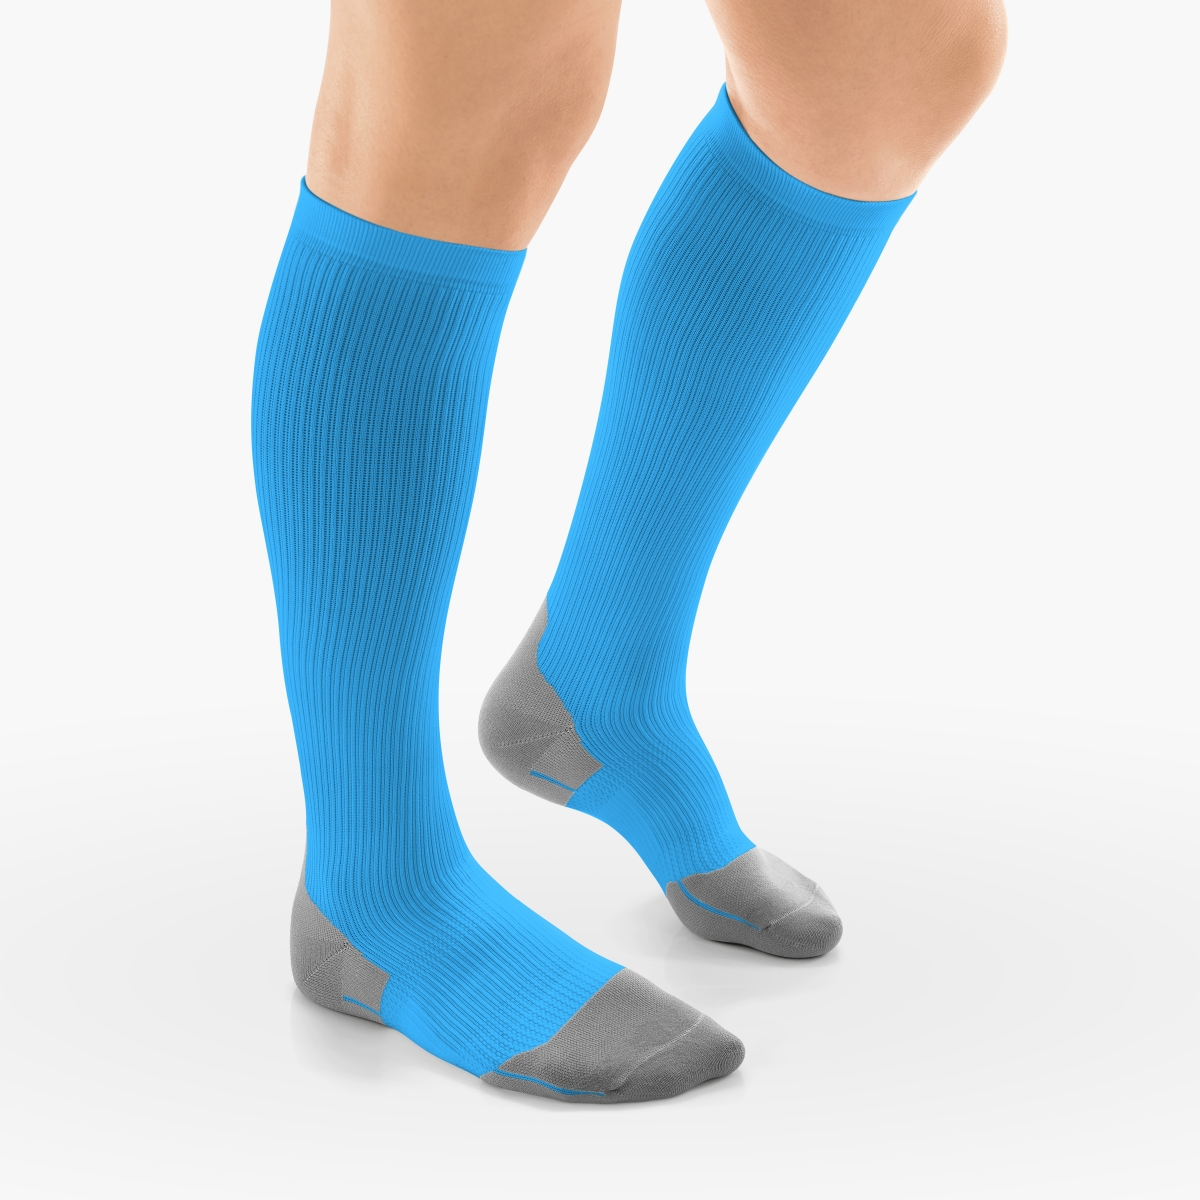 VENOSAN Athletic, Below Knee 20-30, Aqua, S, Closed Toe Firm 20-30 mmHg | Aqua | S |  | Closed Toe | Knit Top